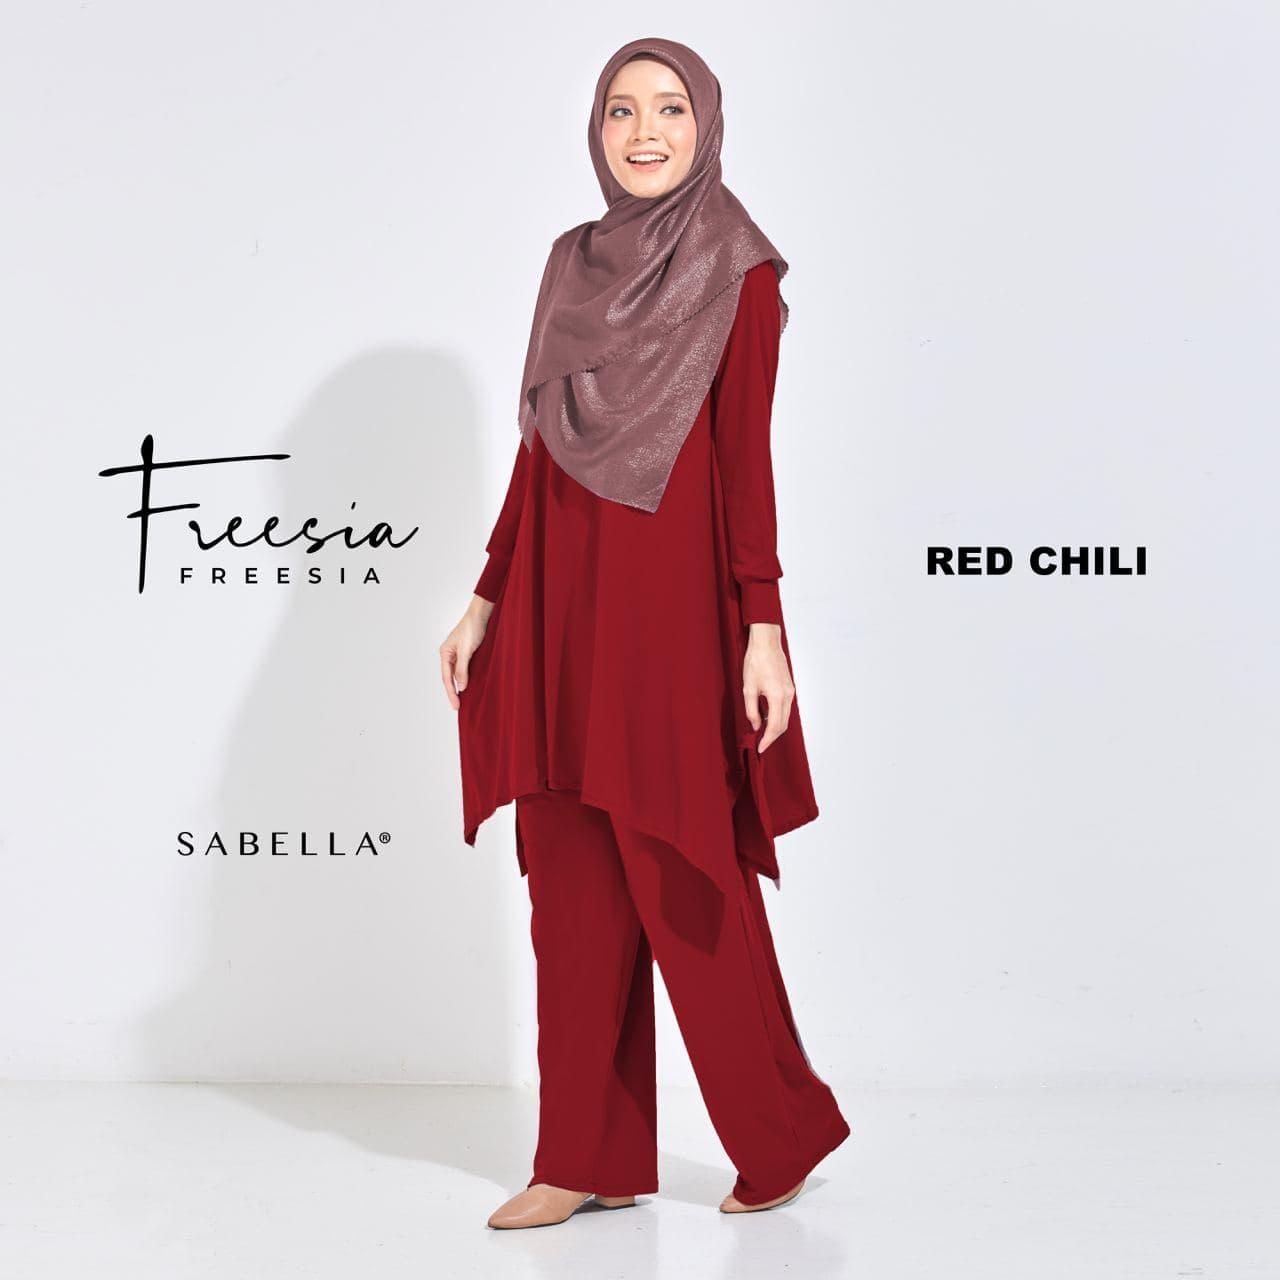 Freesia Red Chili (R)